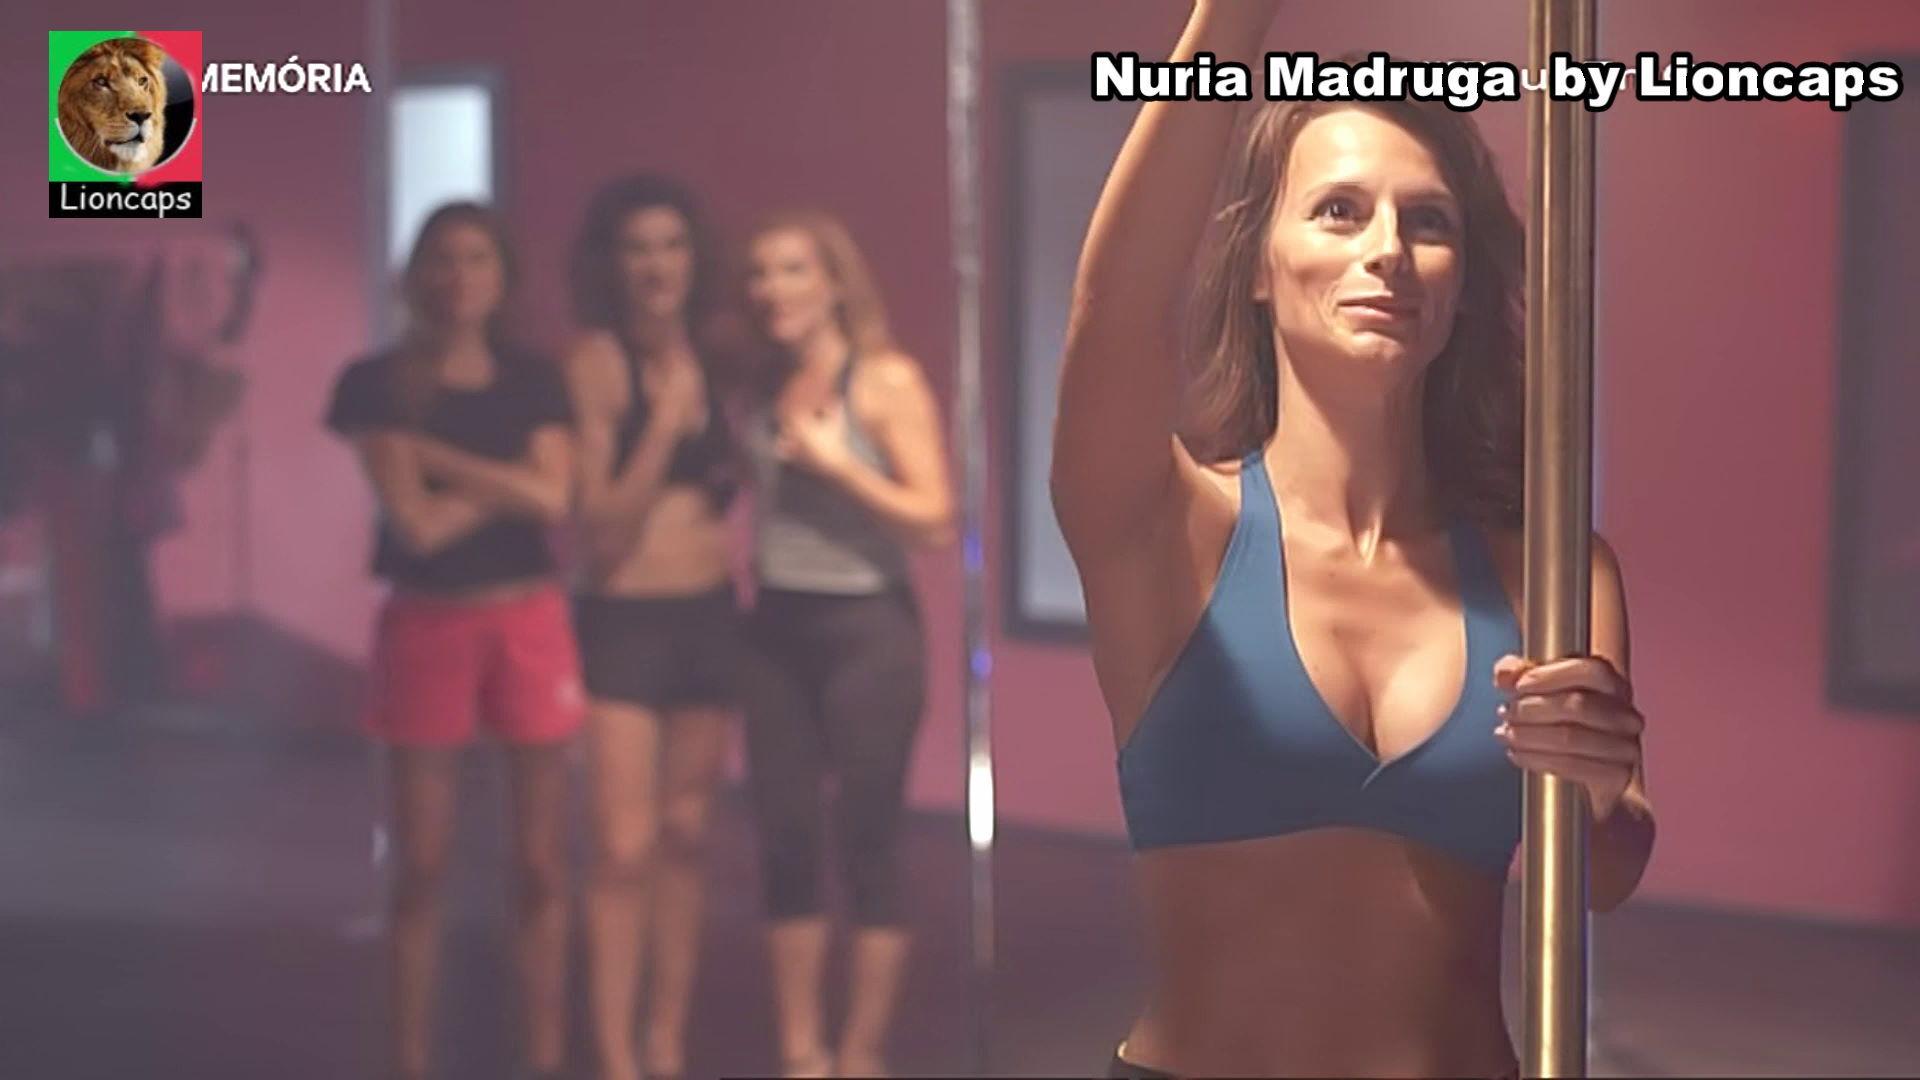 nuria_madruga_vs200421-001 (3).JPG